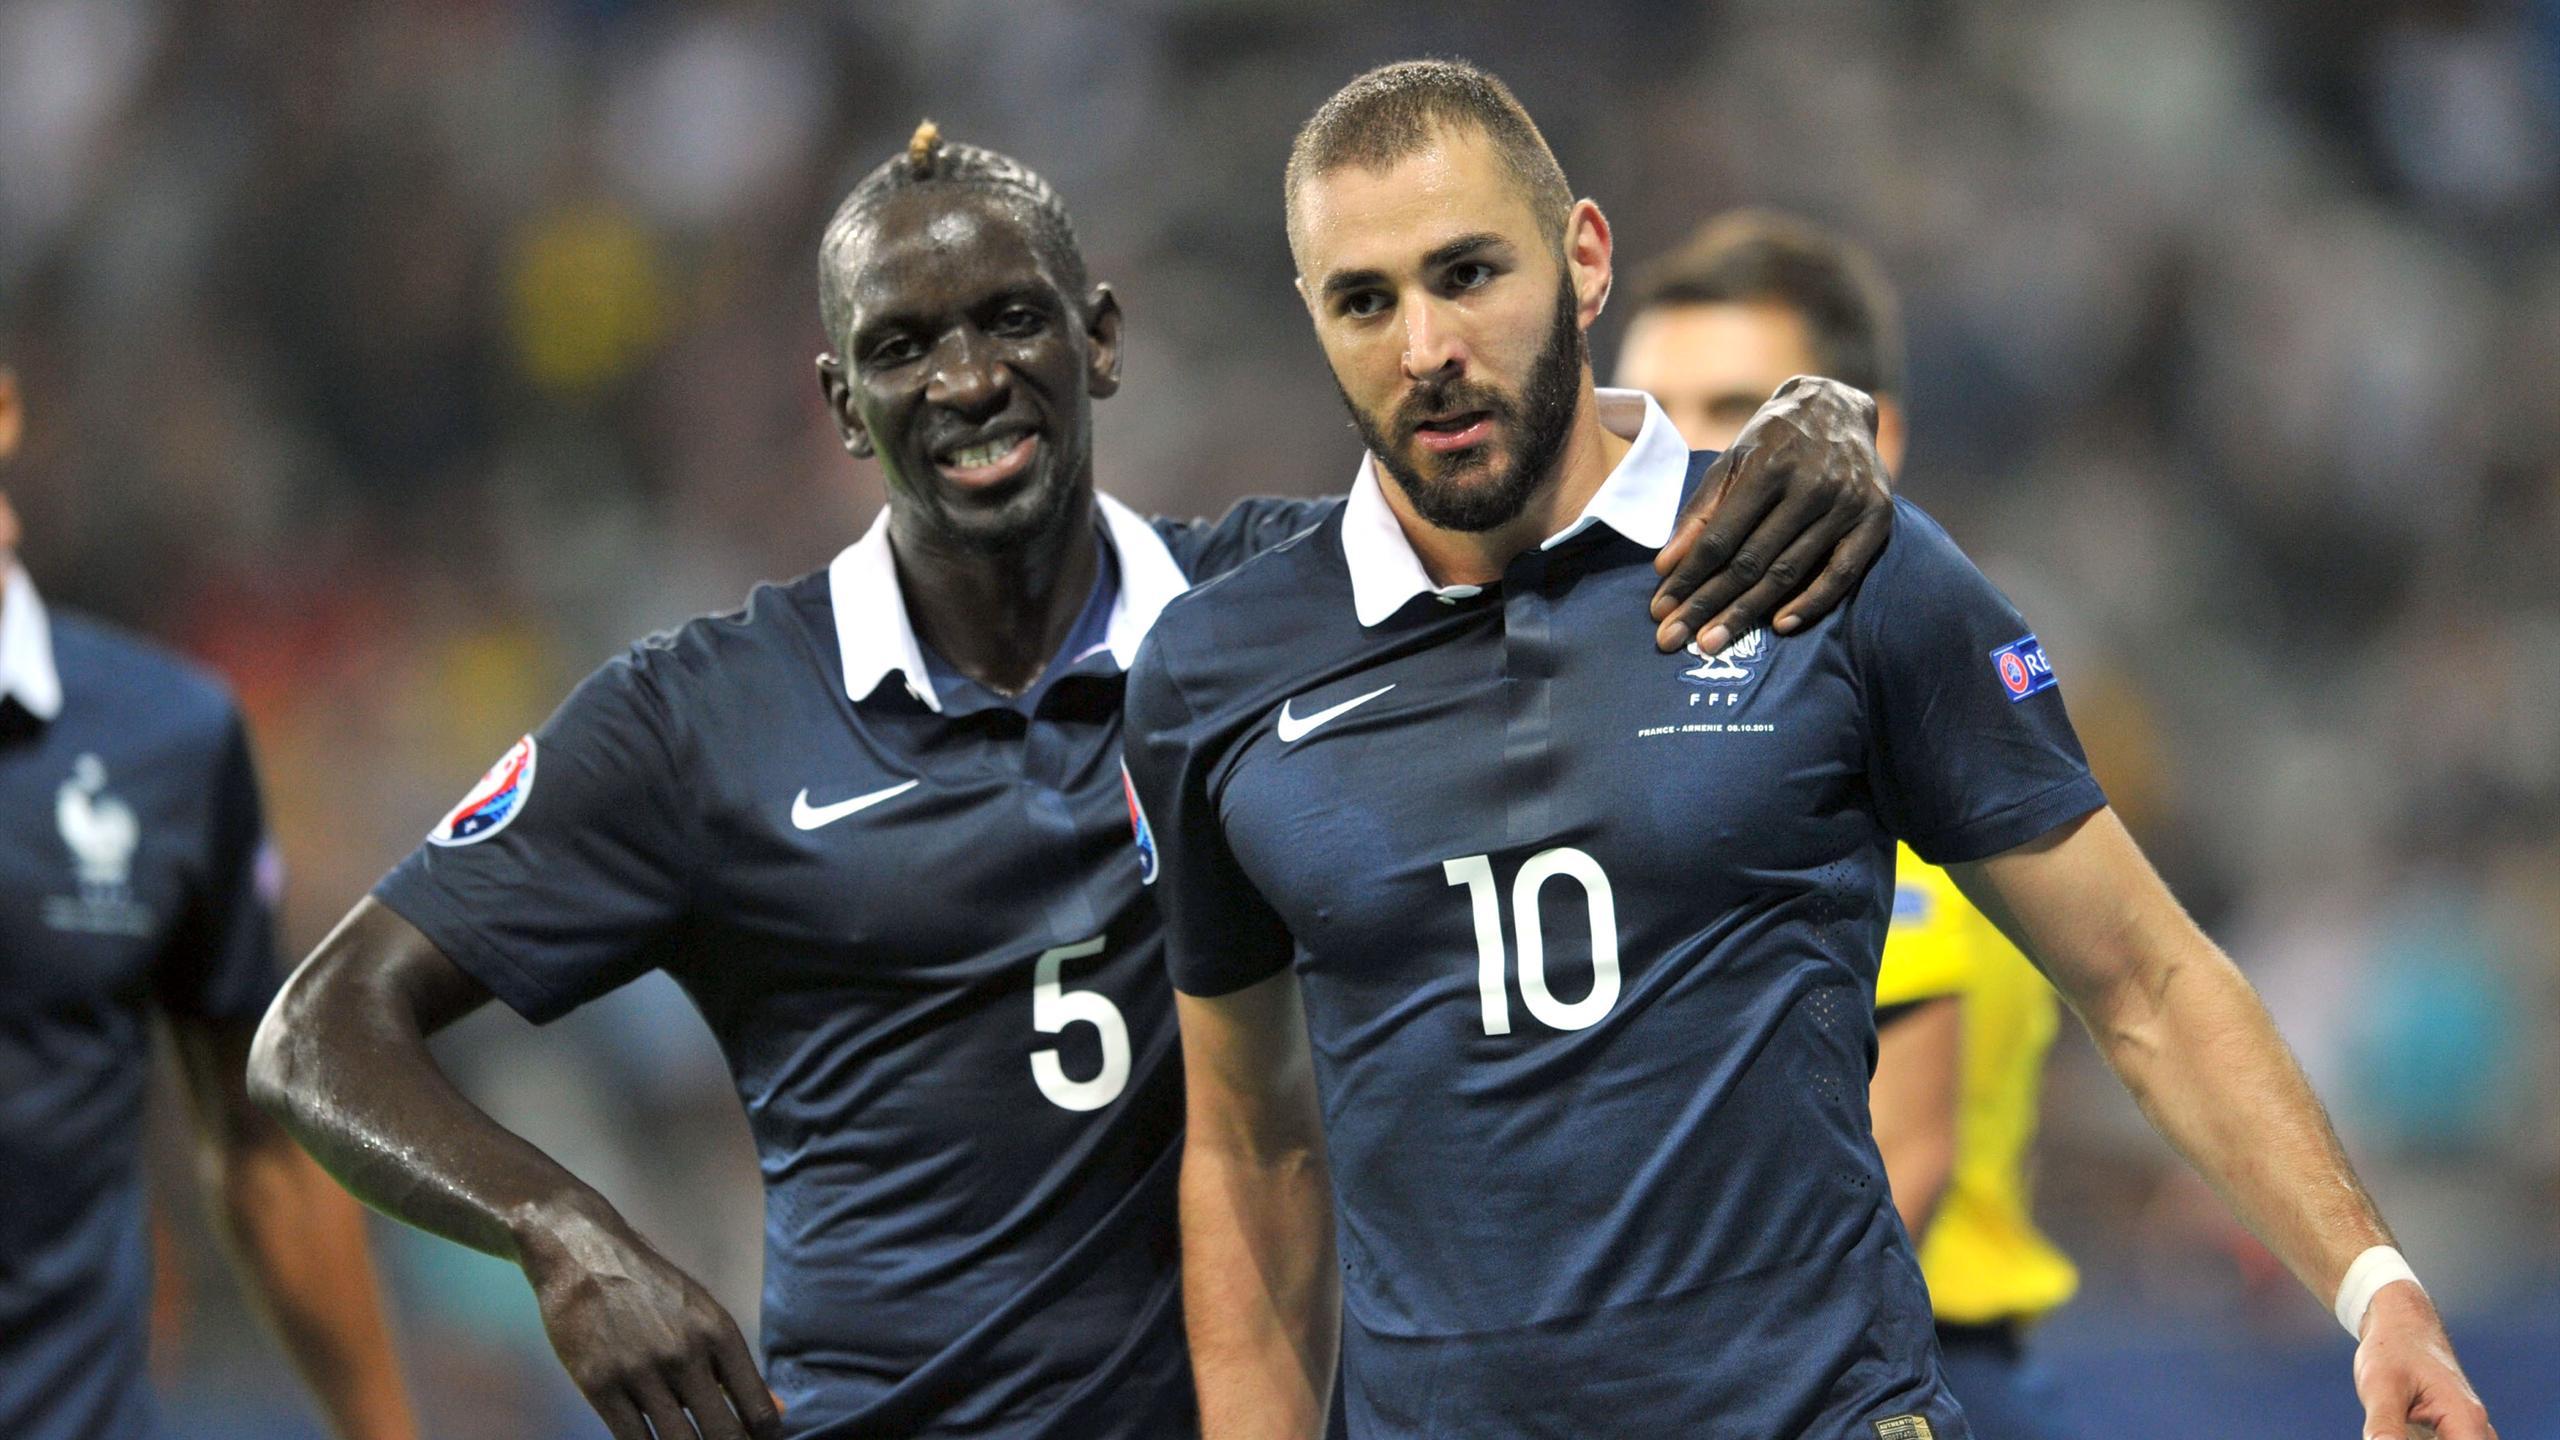 Mamadou Sakho et Karim Benzema lors de France-Arménie en 2015